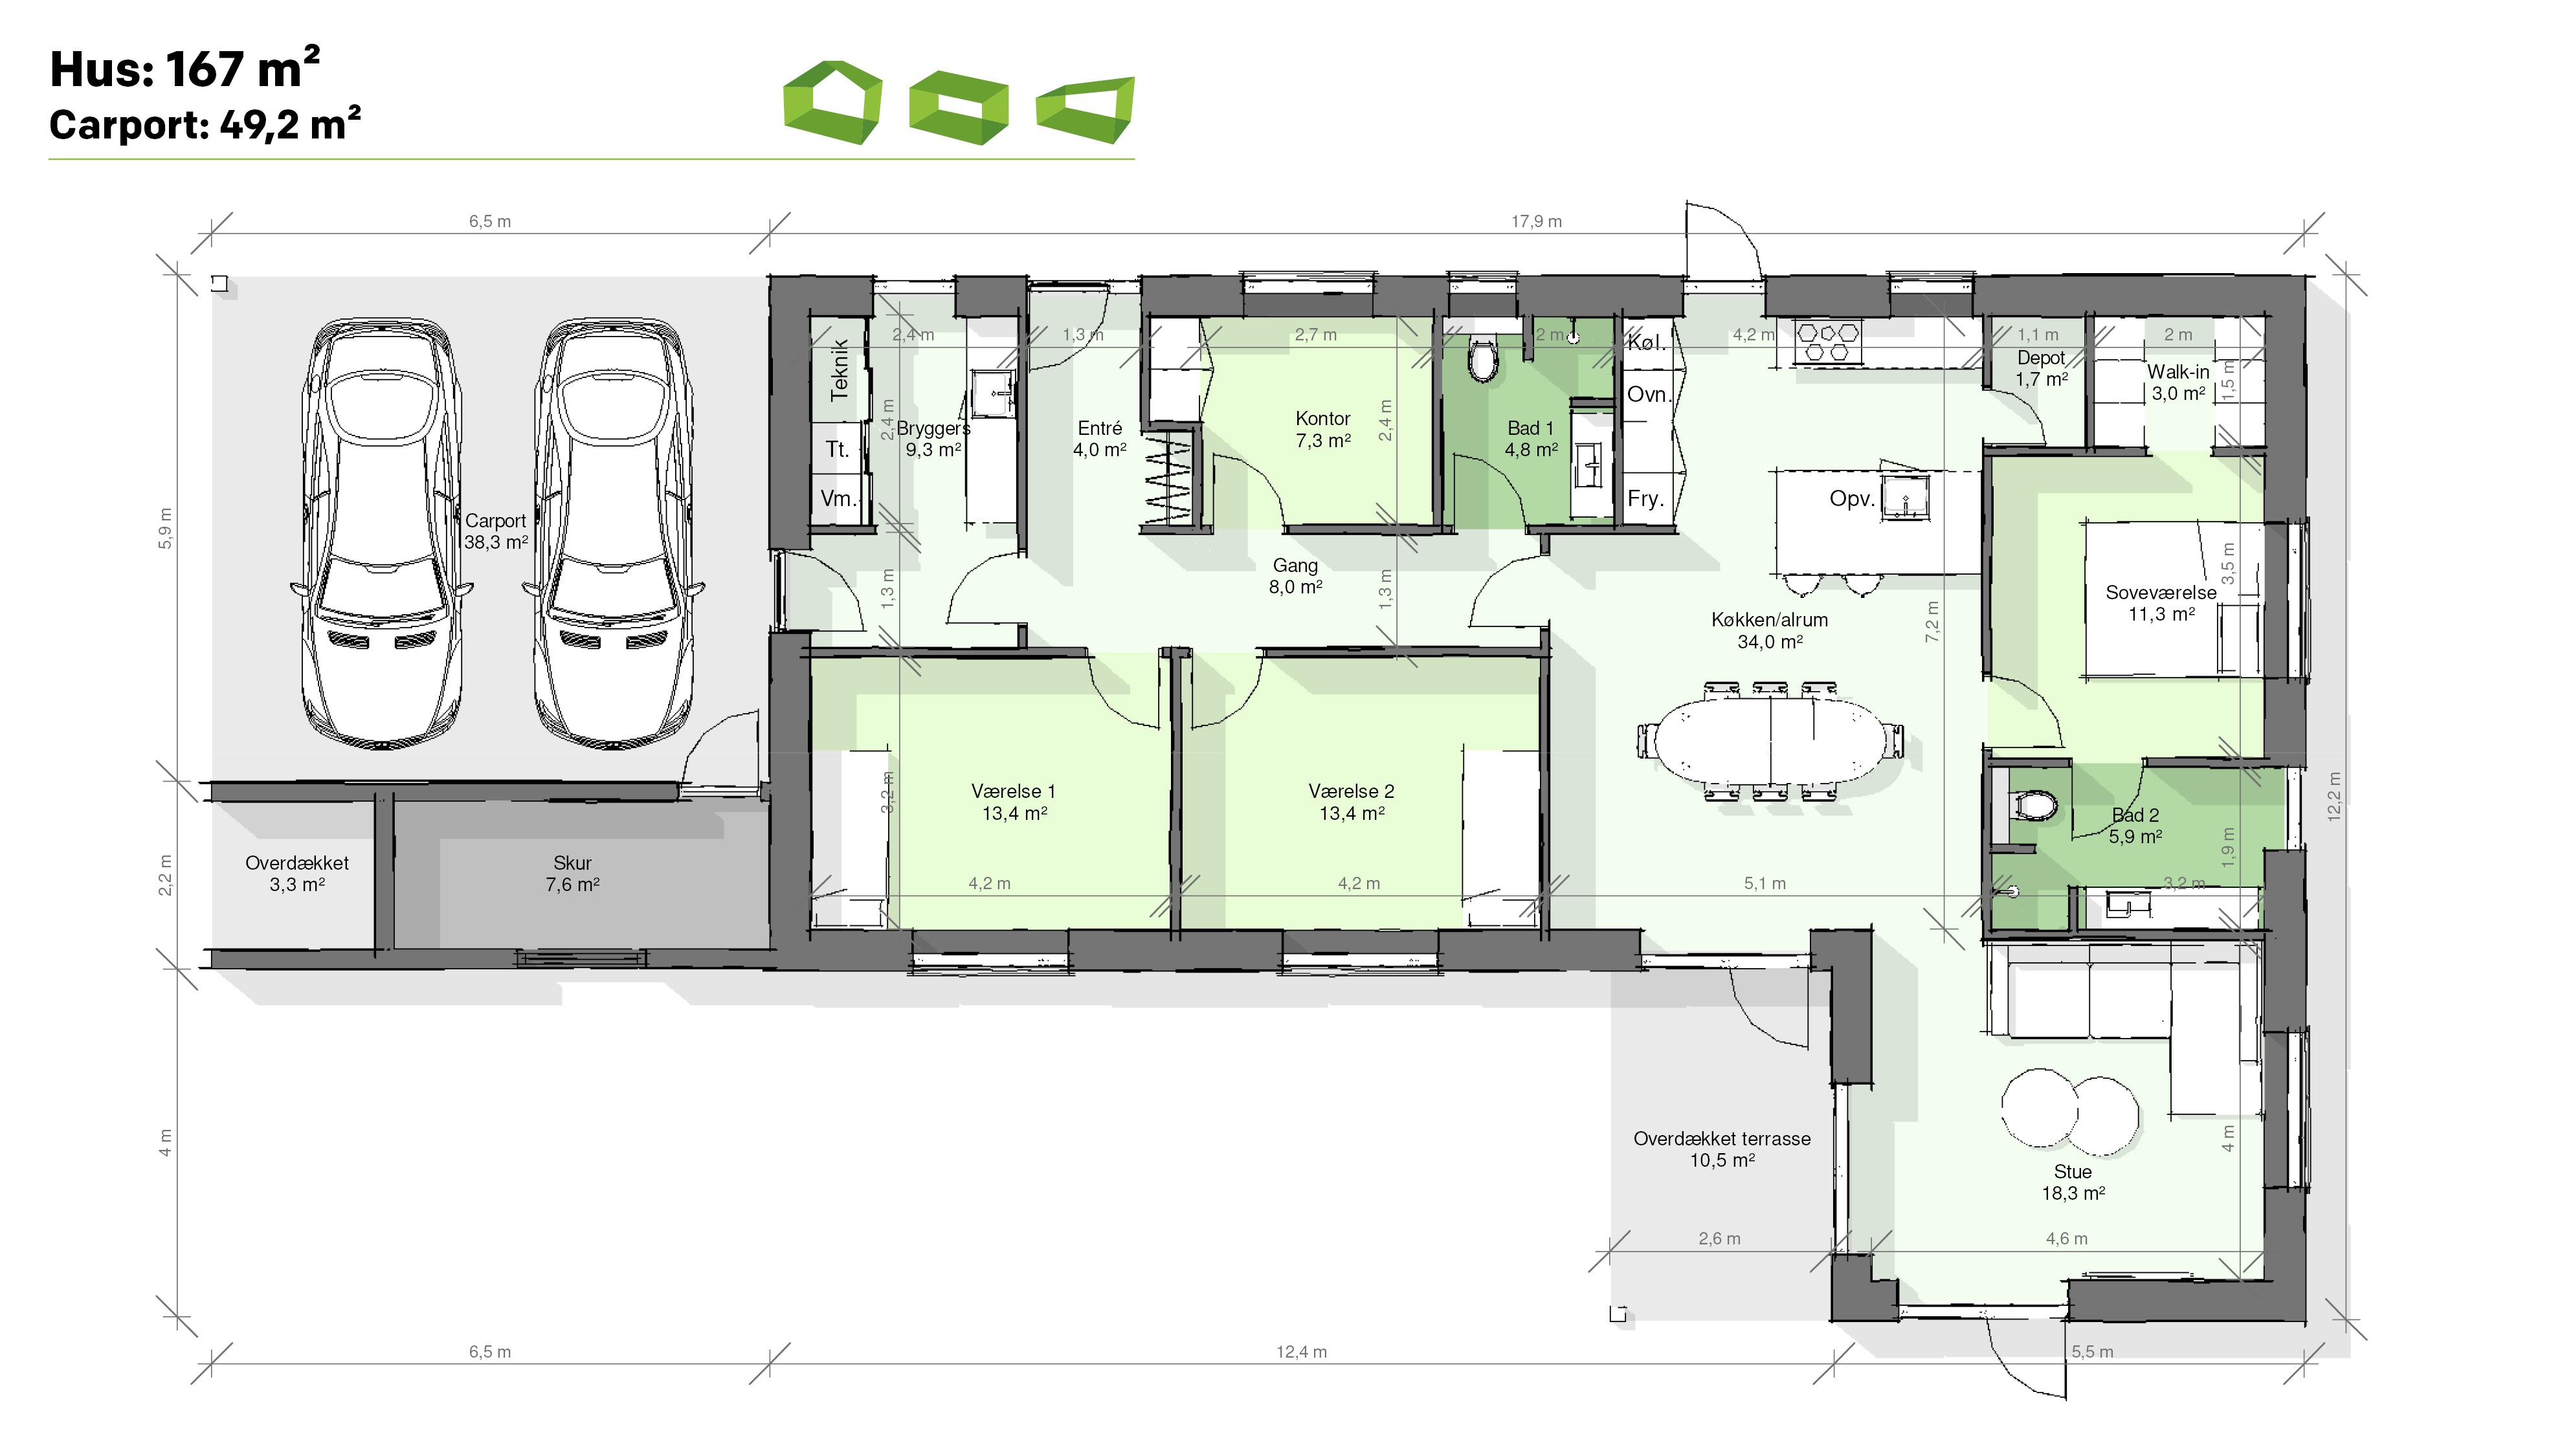 plantegning vinkelhus 167 m2